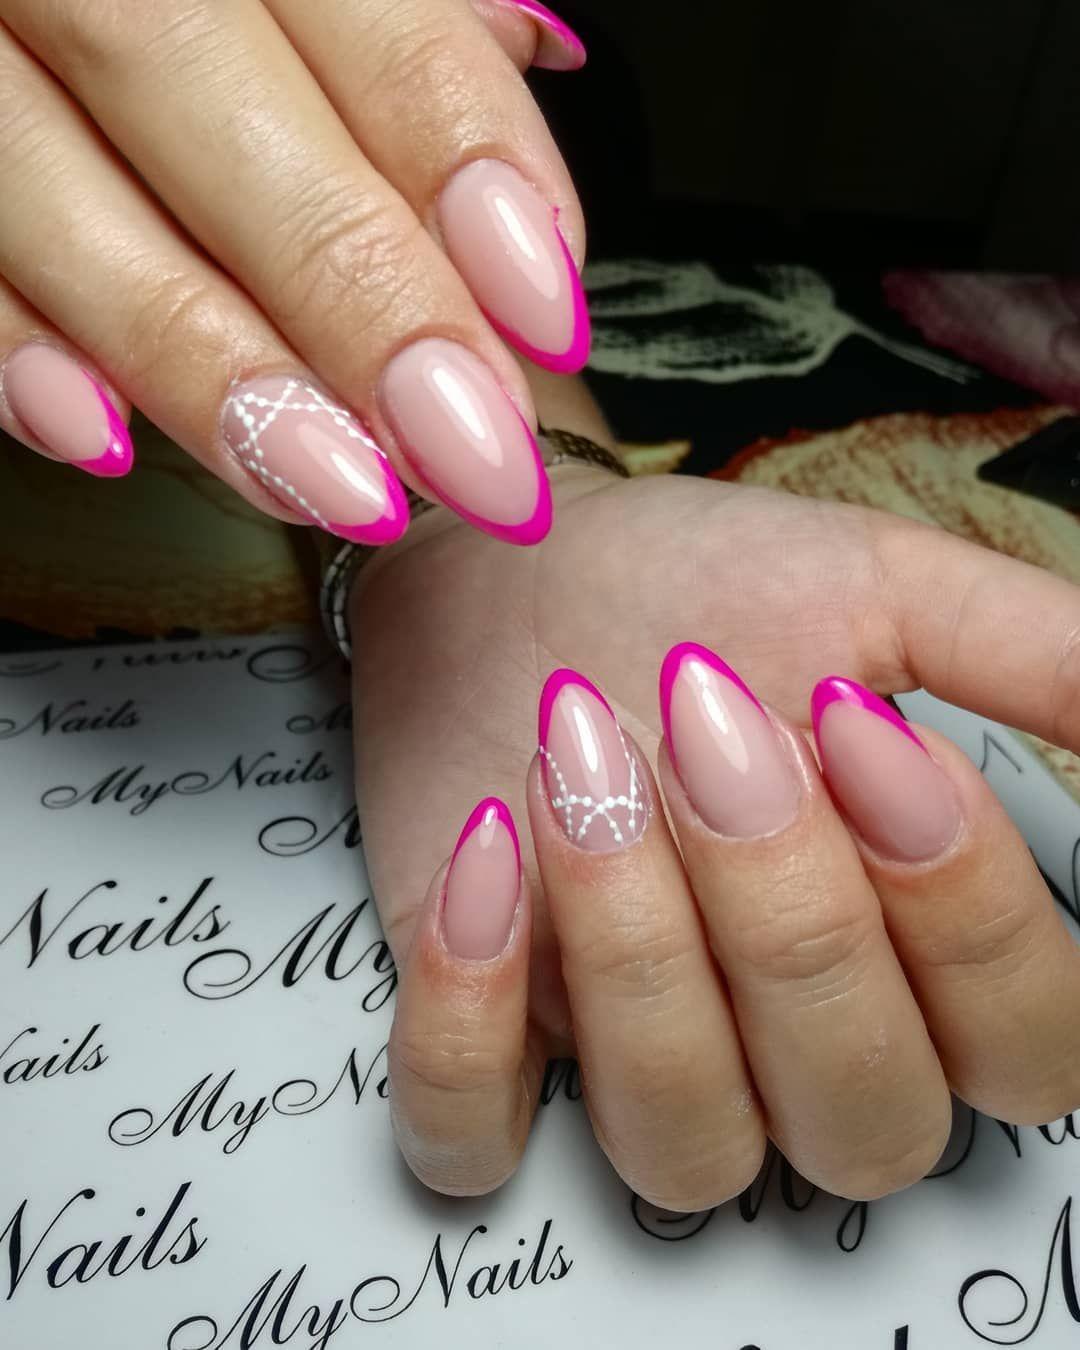 Pin By Fashion Hub On Fashion Hub How To Do Nails Nails Nail